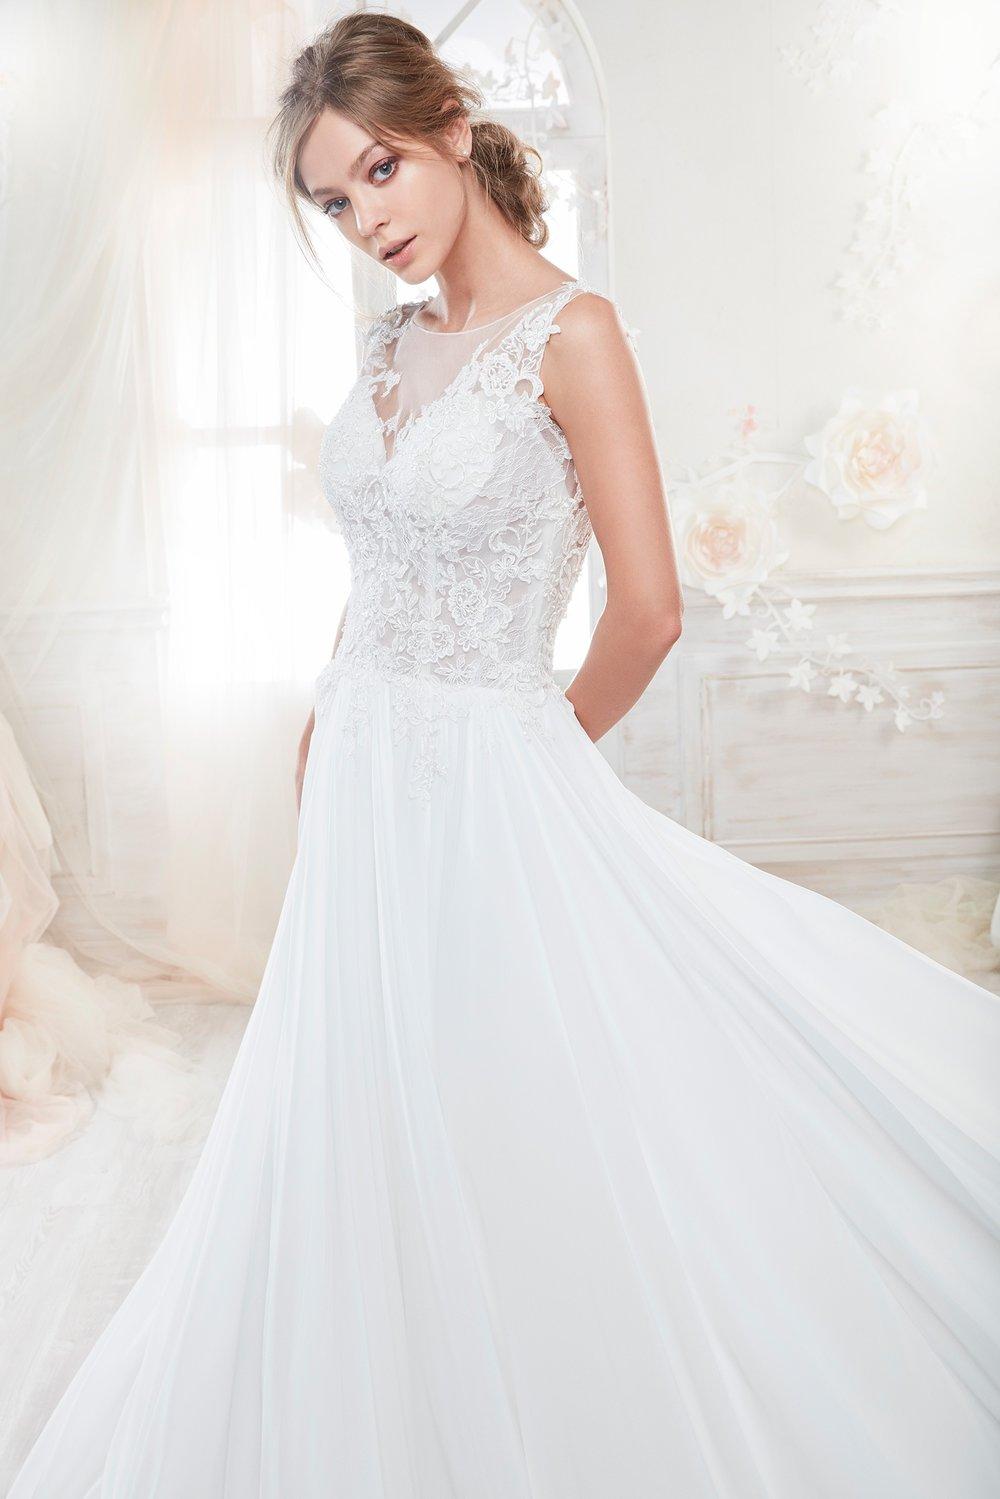 nicole-spose-COAB18276-Colet-moda-sposa-2018-988.jpg